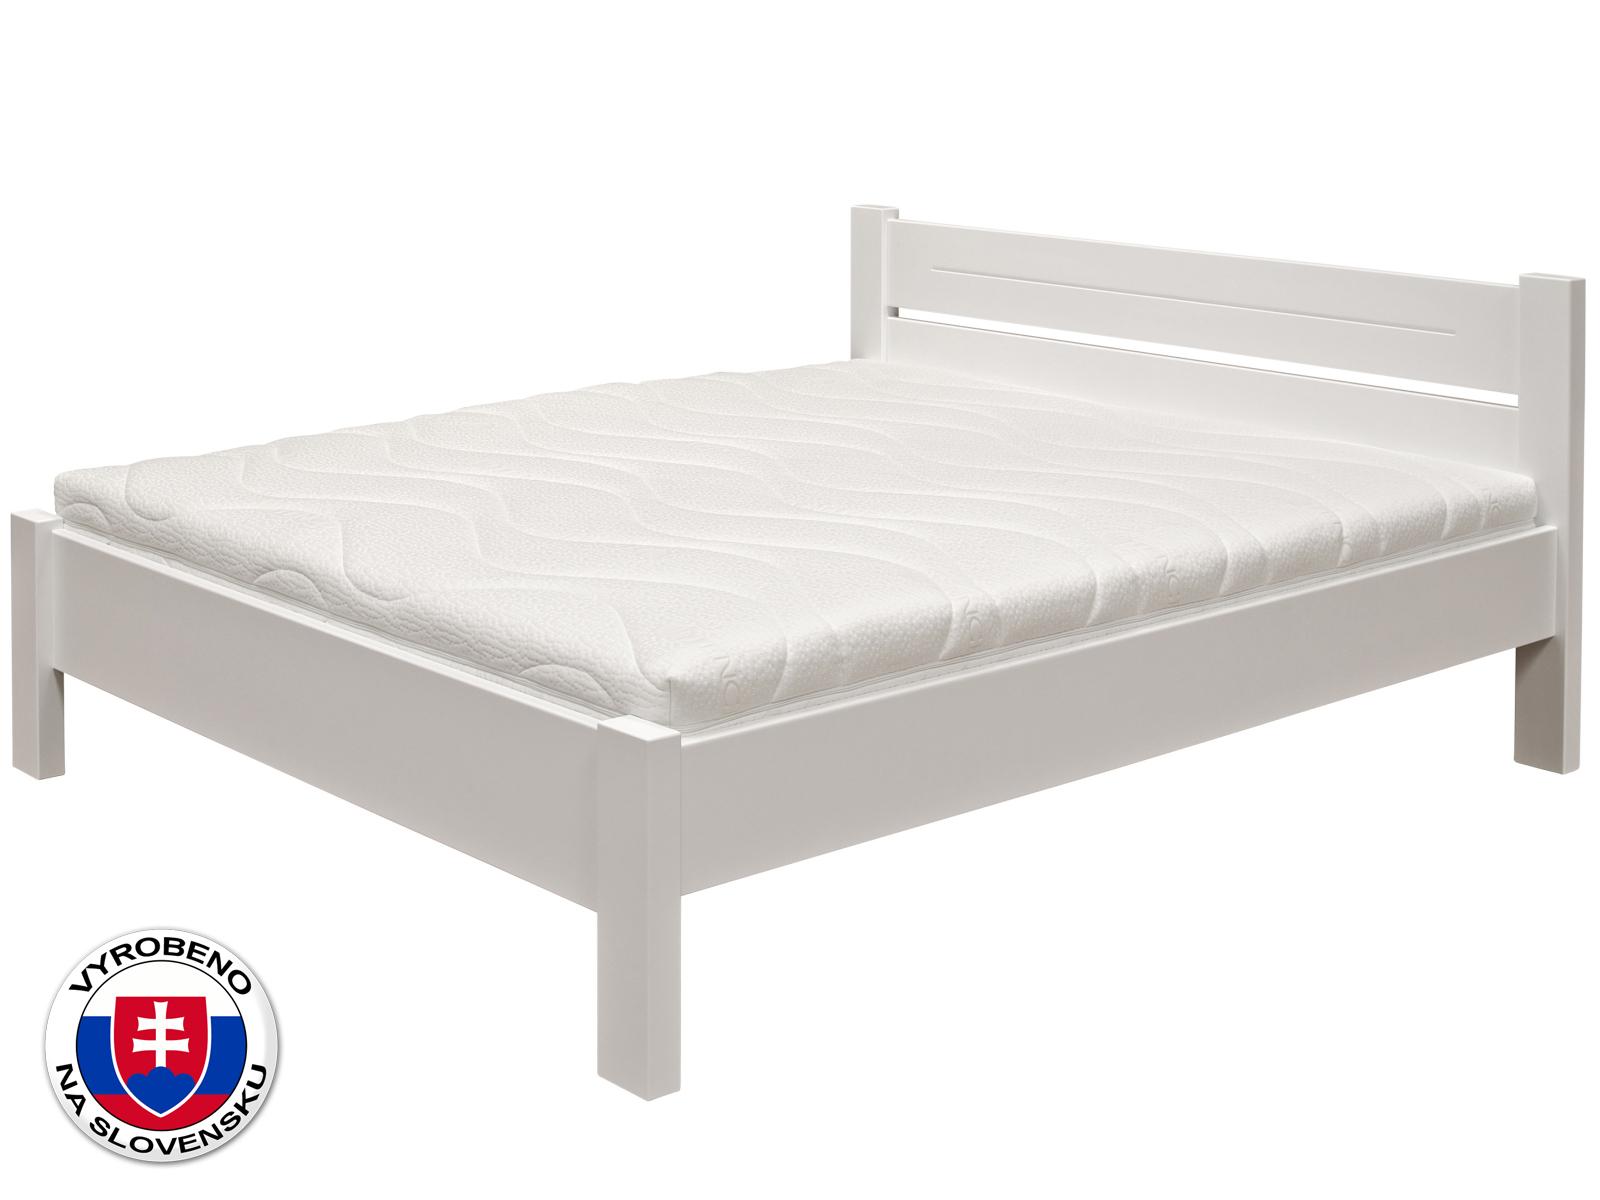 Jednolůžková postel 90 cm - Purtex - Ema (masiv)